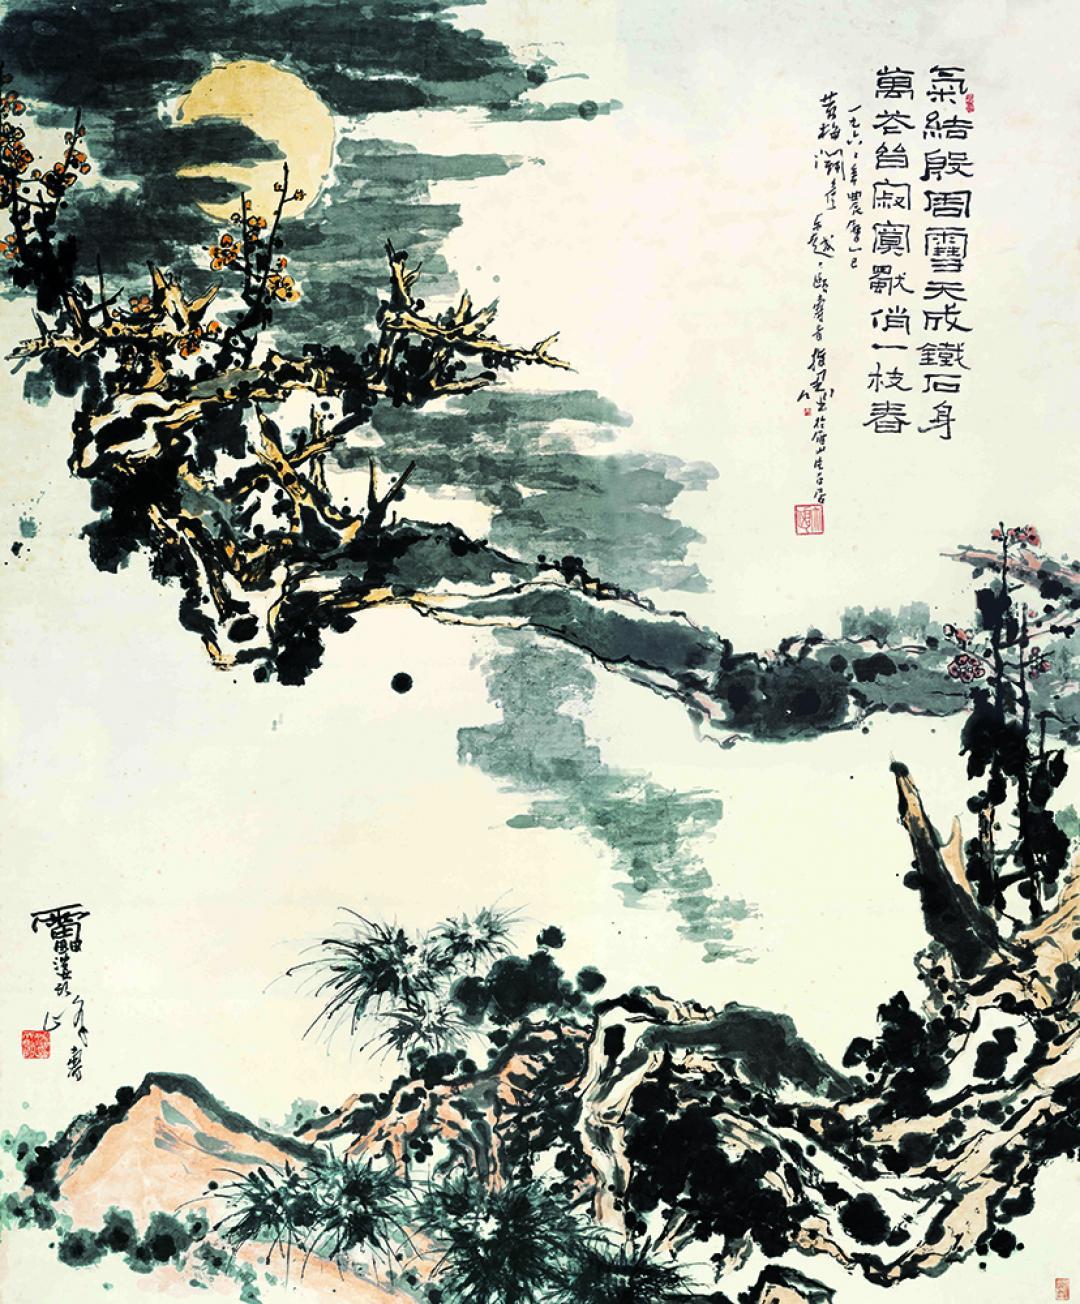 Pan Tianshou, Plum Tree and Moon